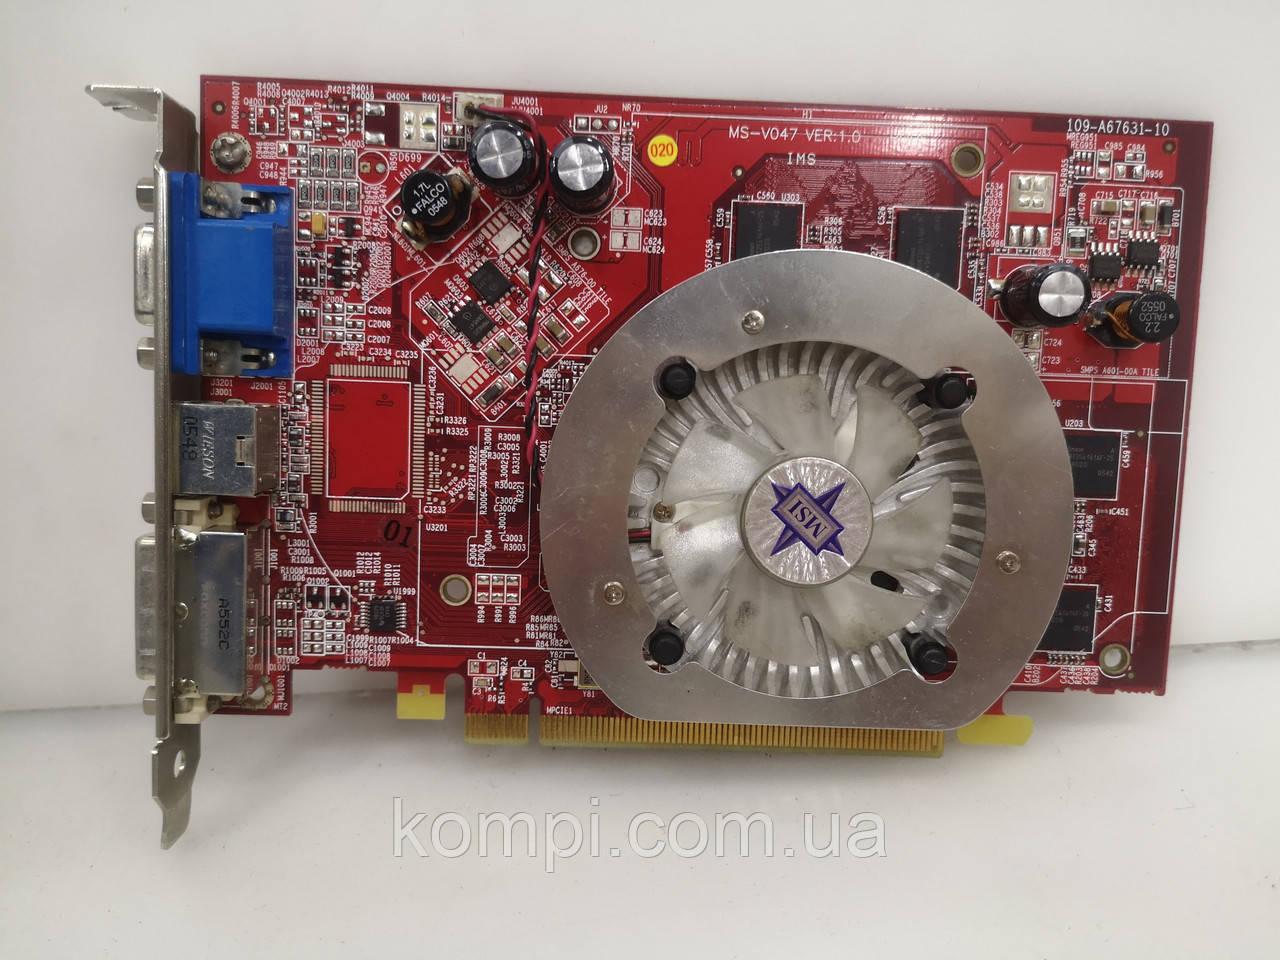 Видеокарта ASUS ATI Radeon X1300 256mb PCI-E